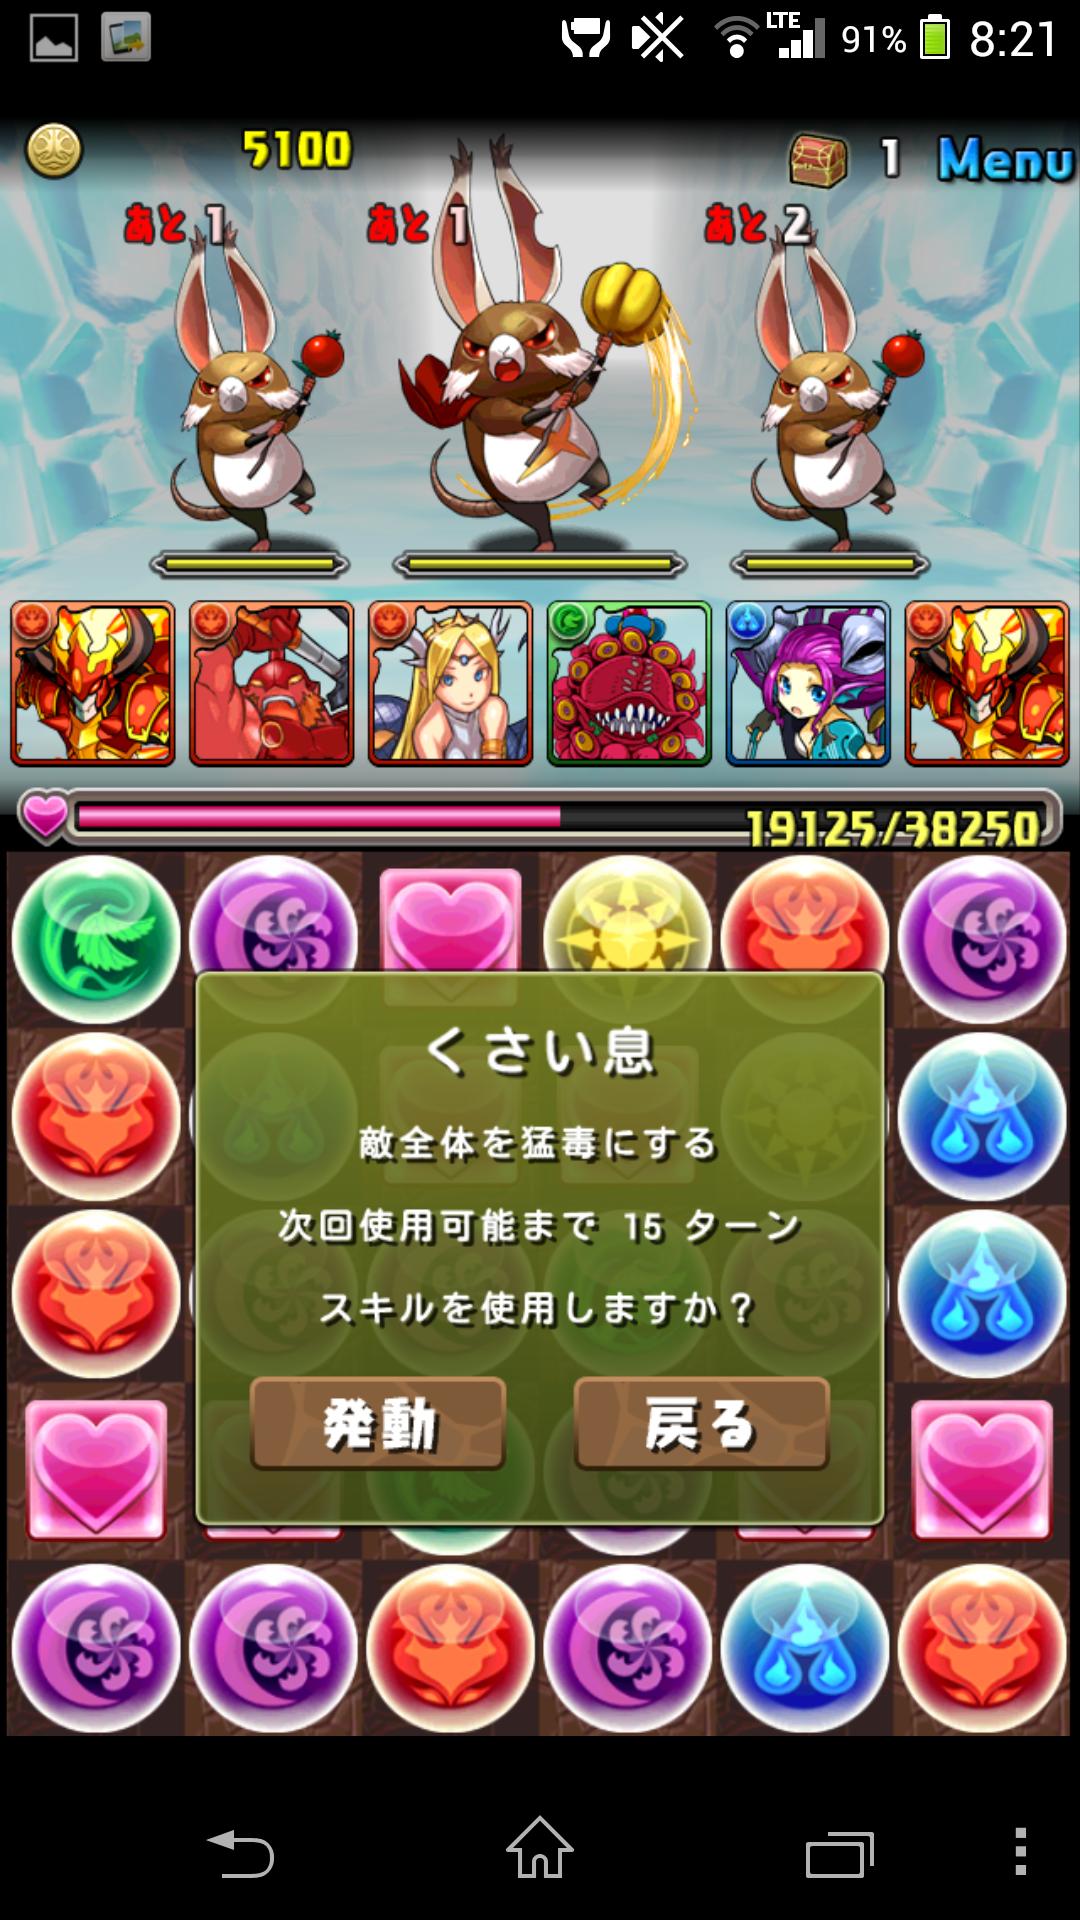 Screenshot_2014-04-04-08-21-21.png